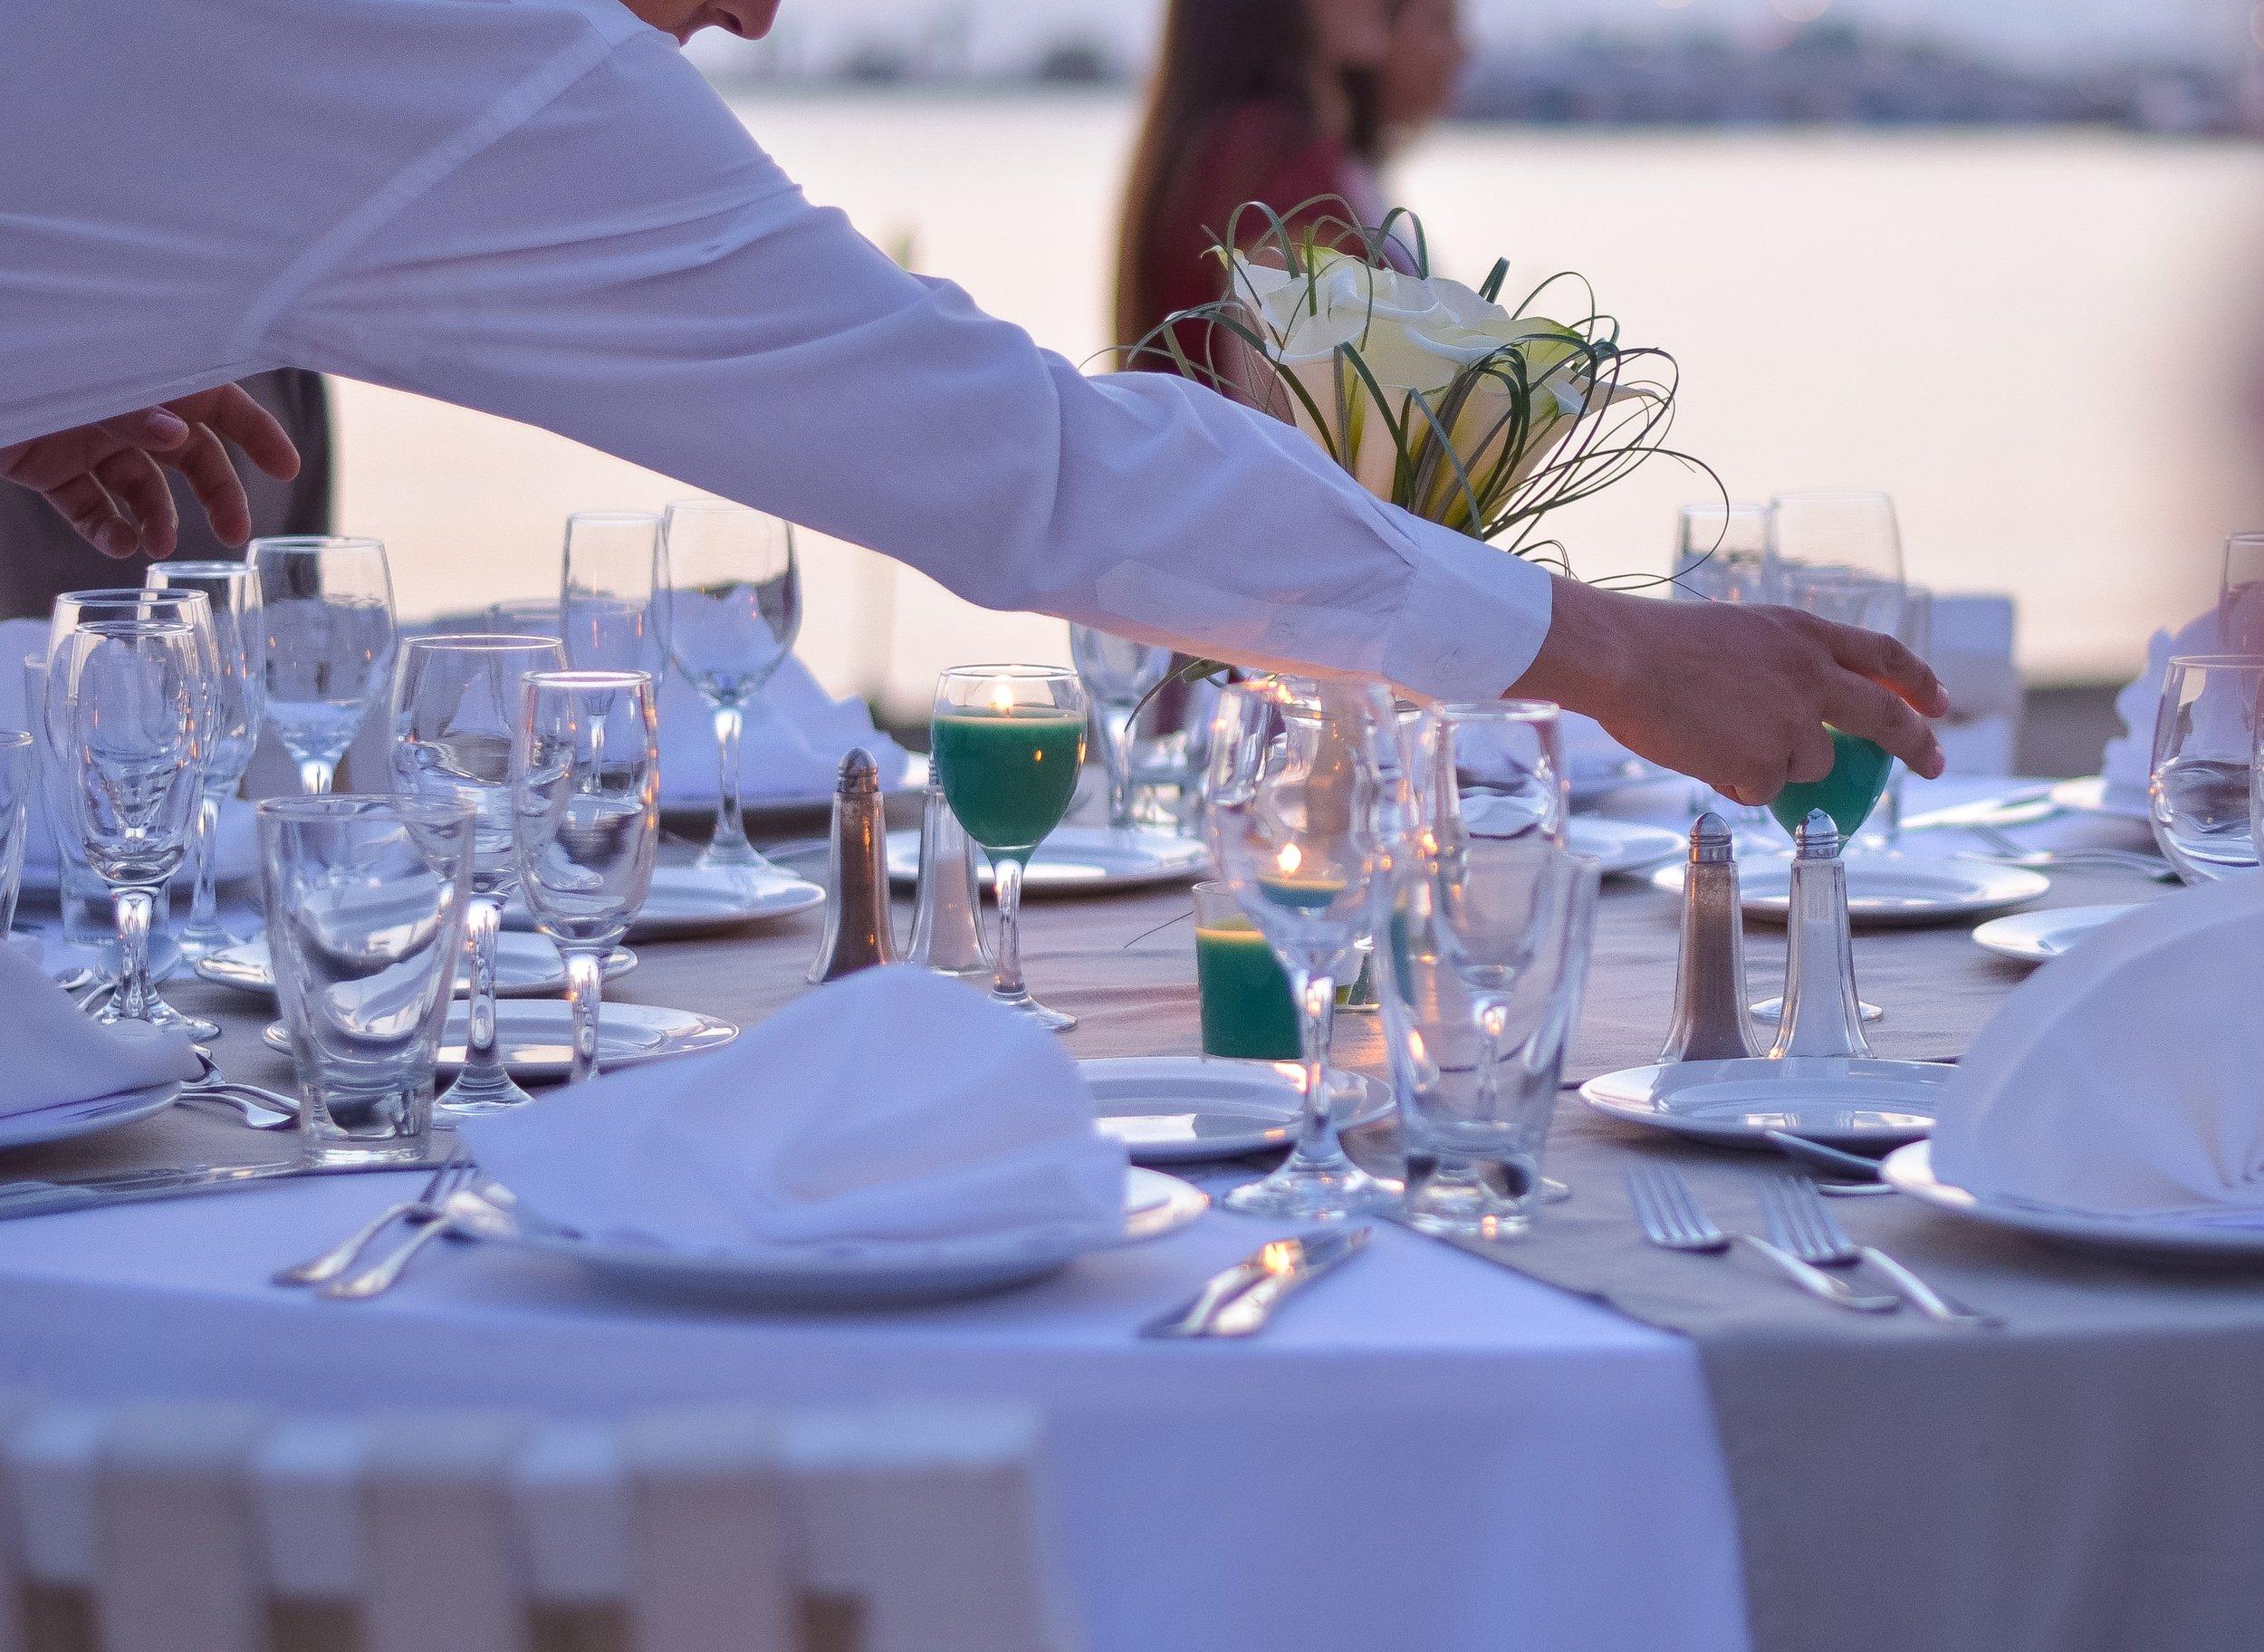 catering-celebration-decorations-1036567.jpg